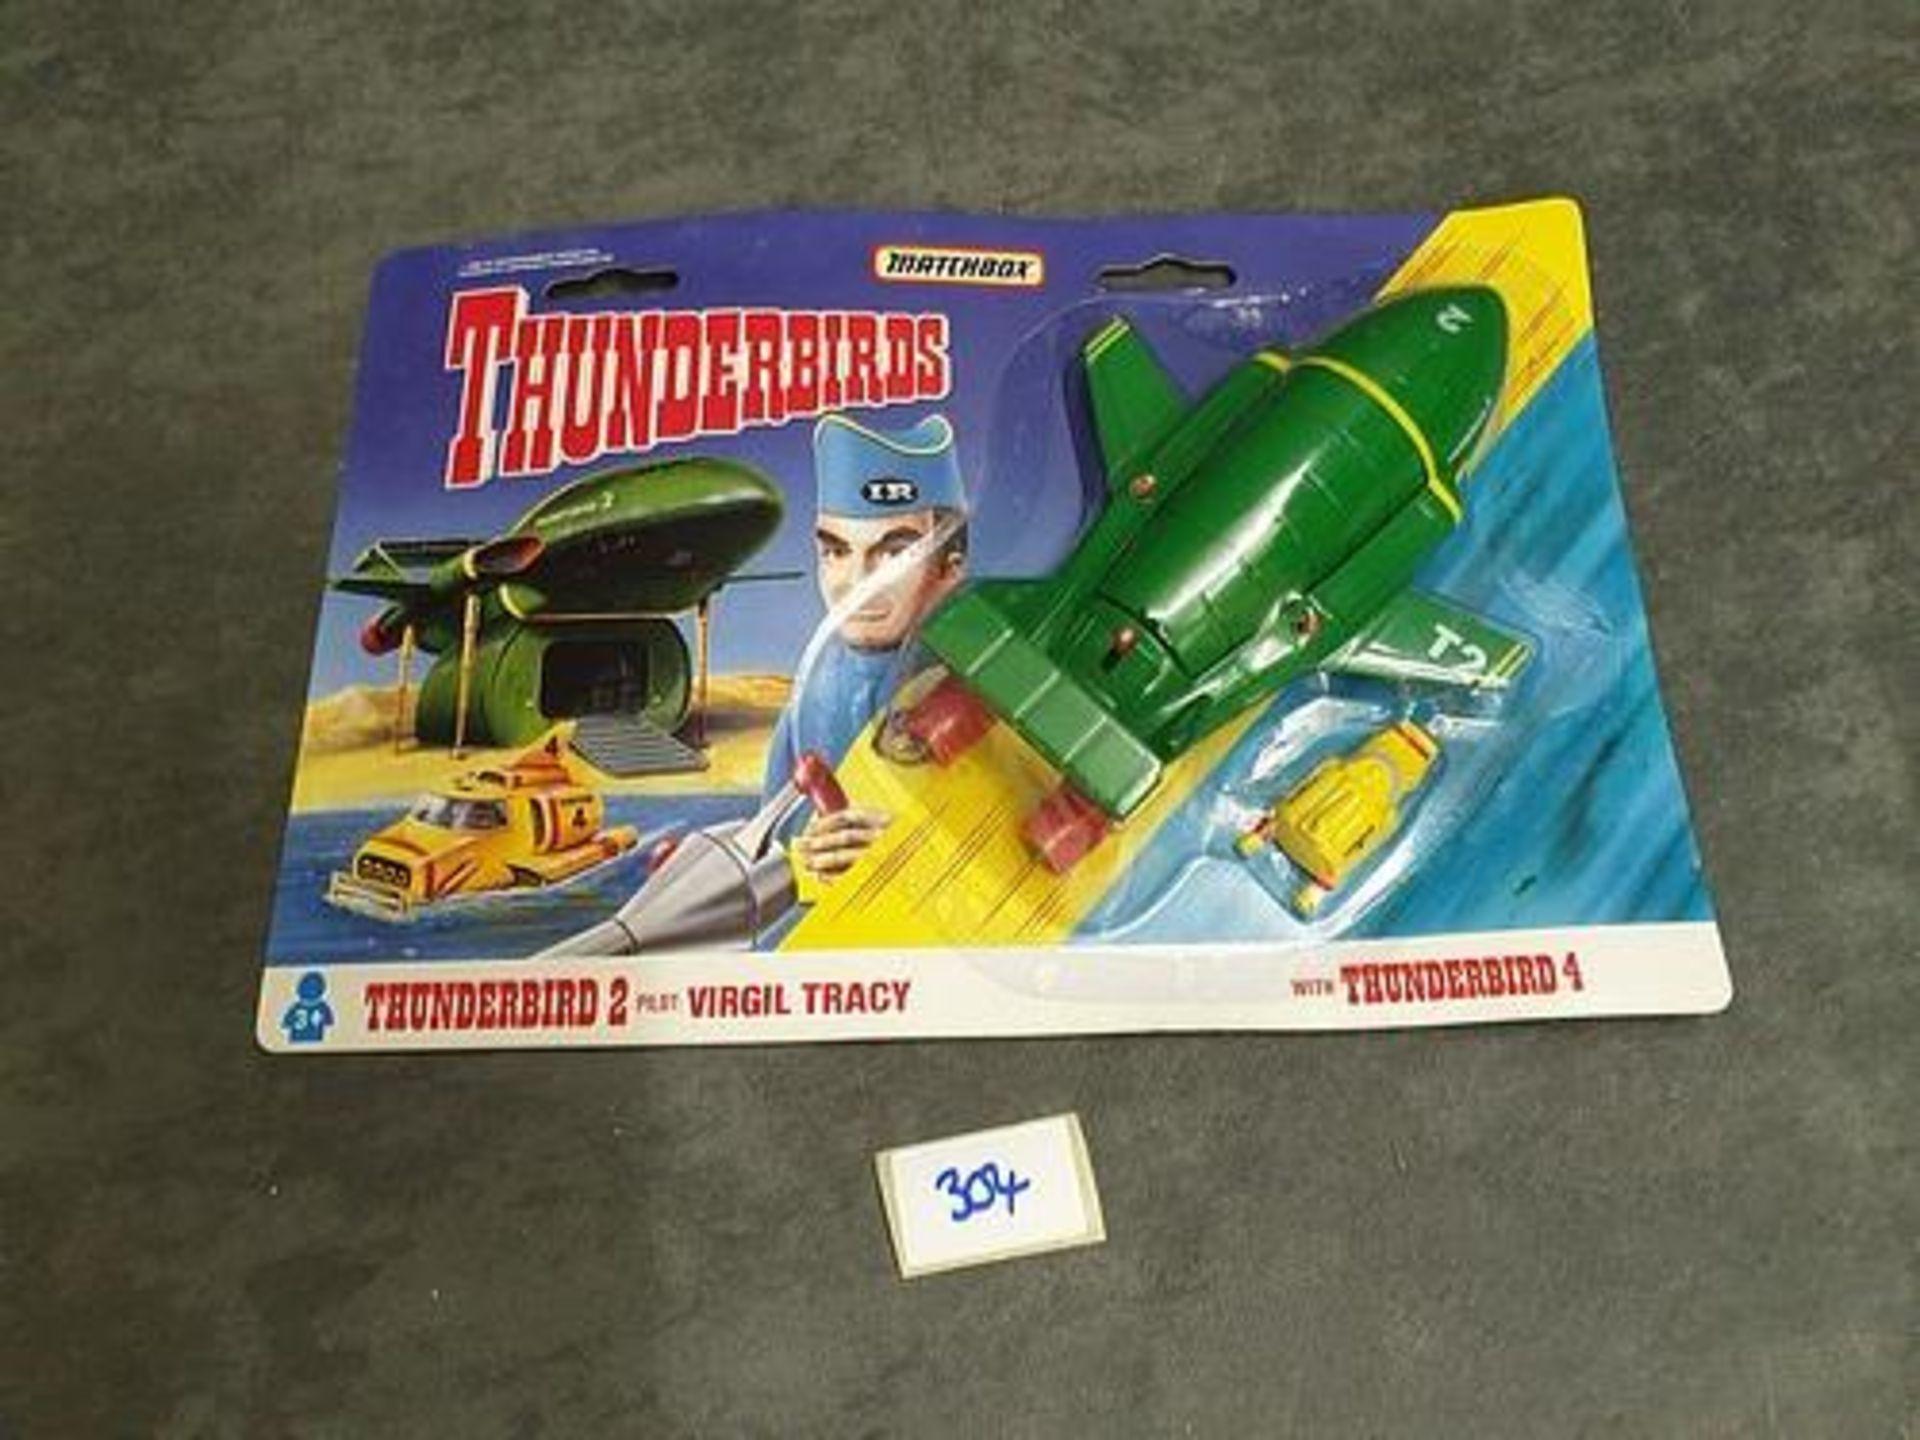 Matchbox Thunderbirds #TB-002 Virgil Tracy's Thunderbird 2 On Unopened Card